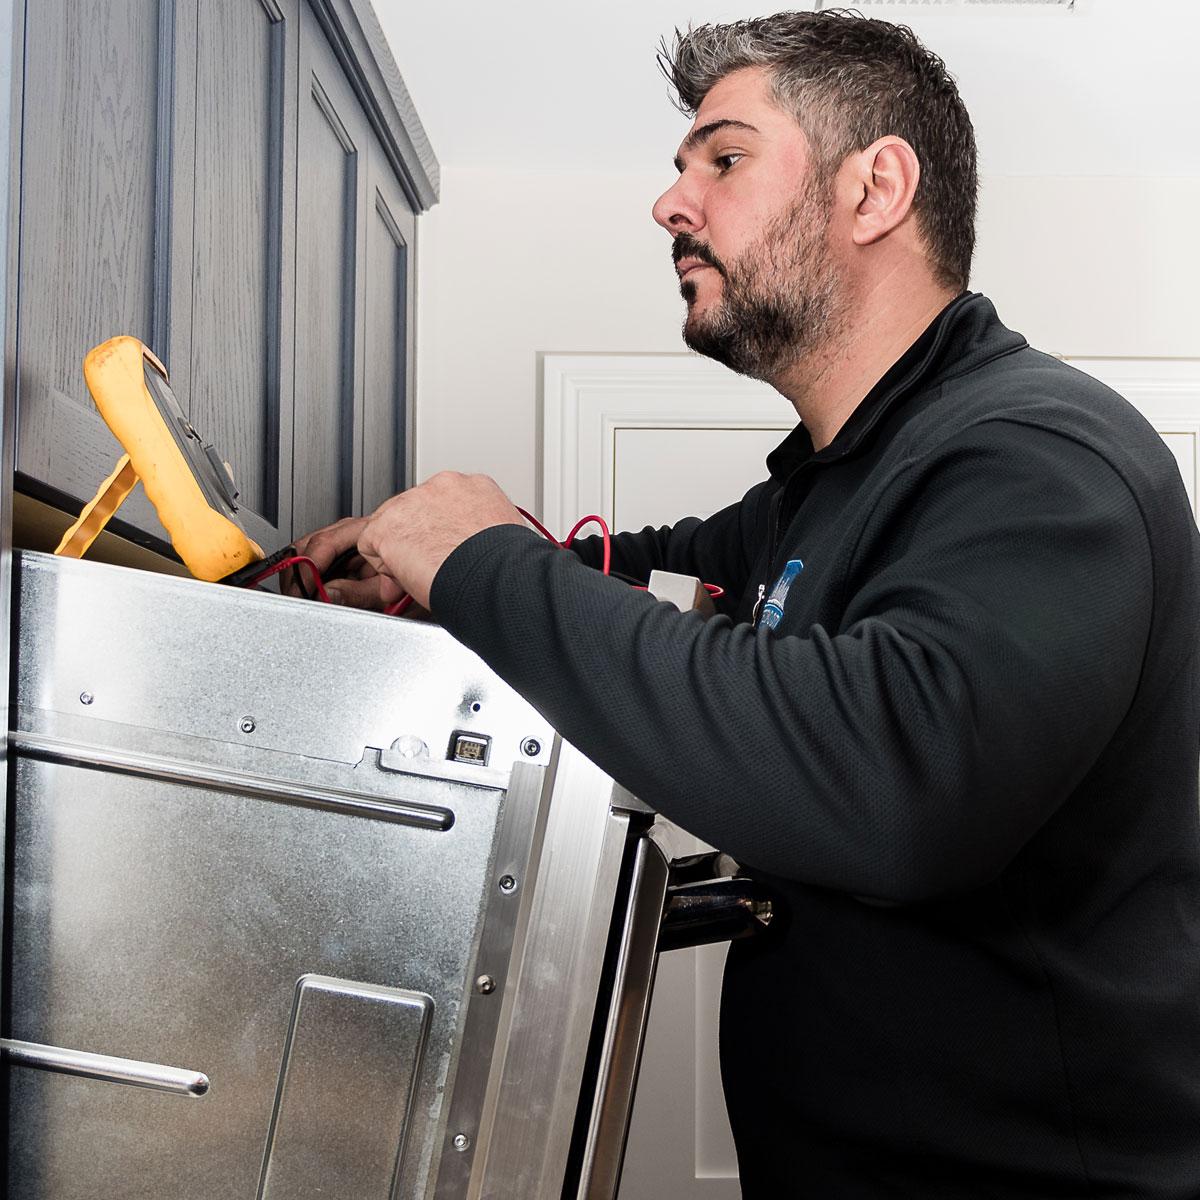 Second City Appliance Repair